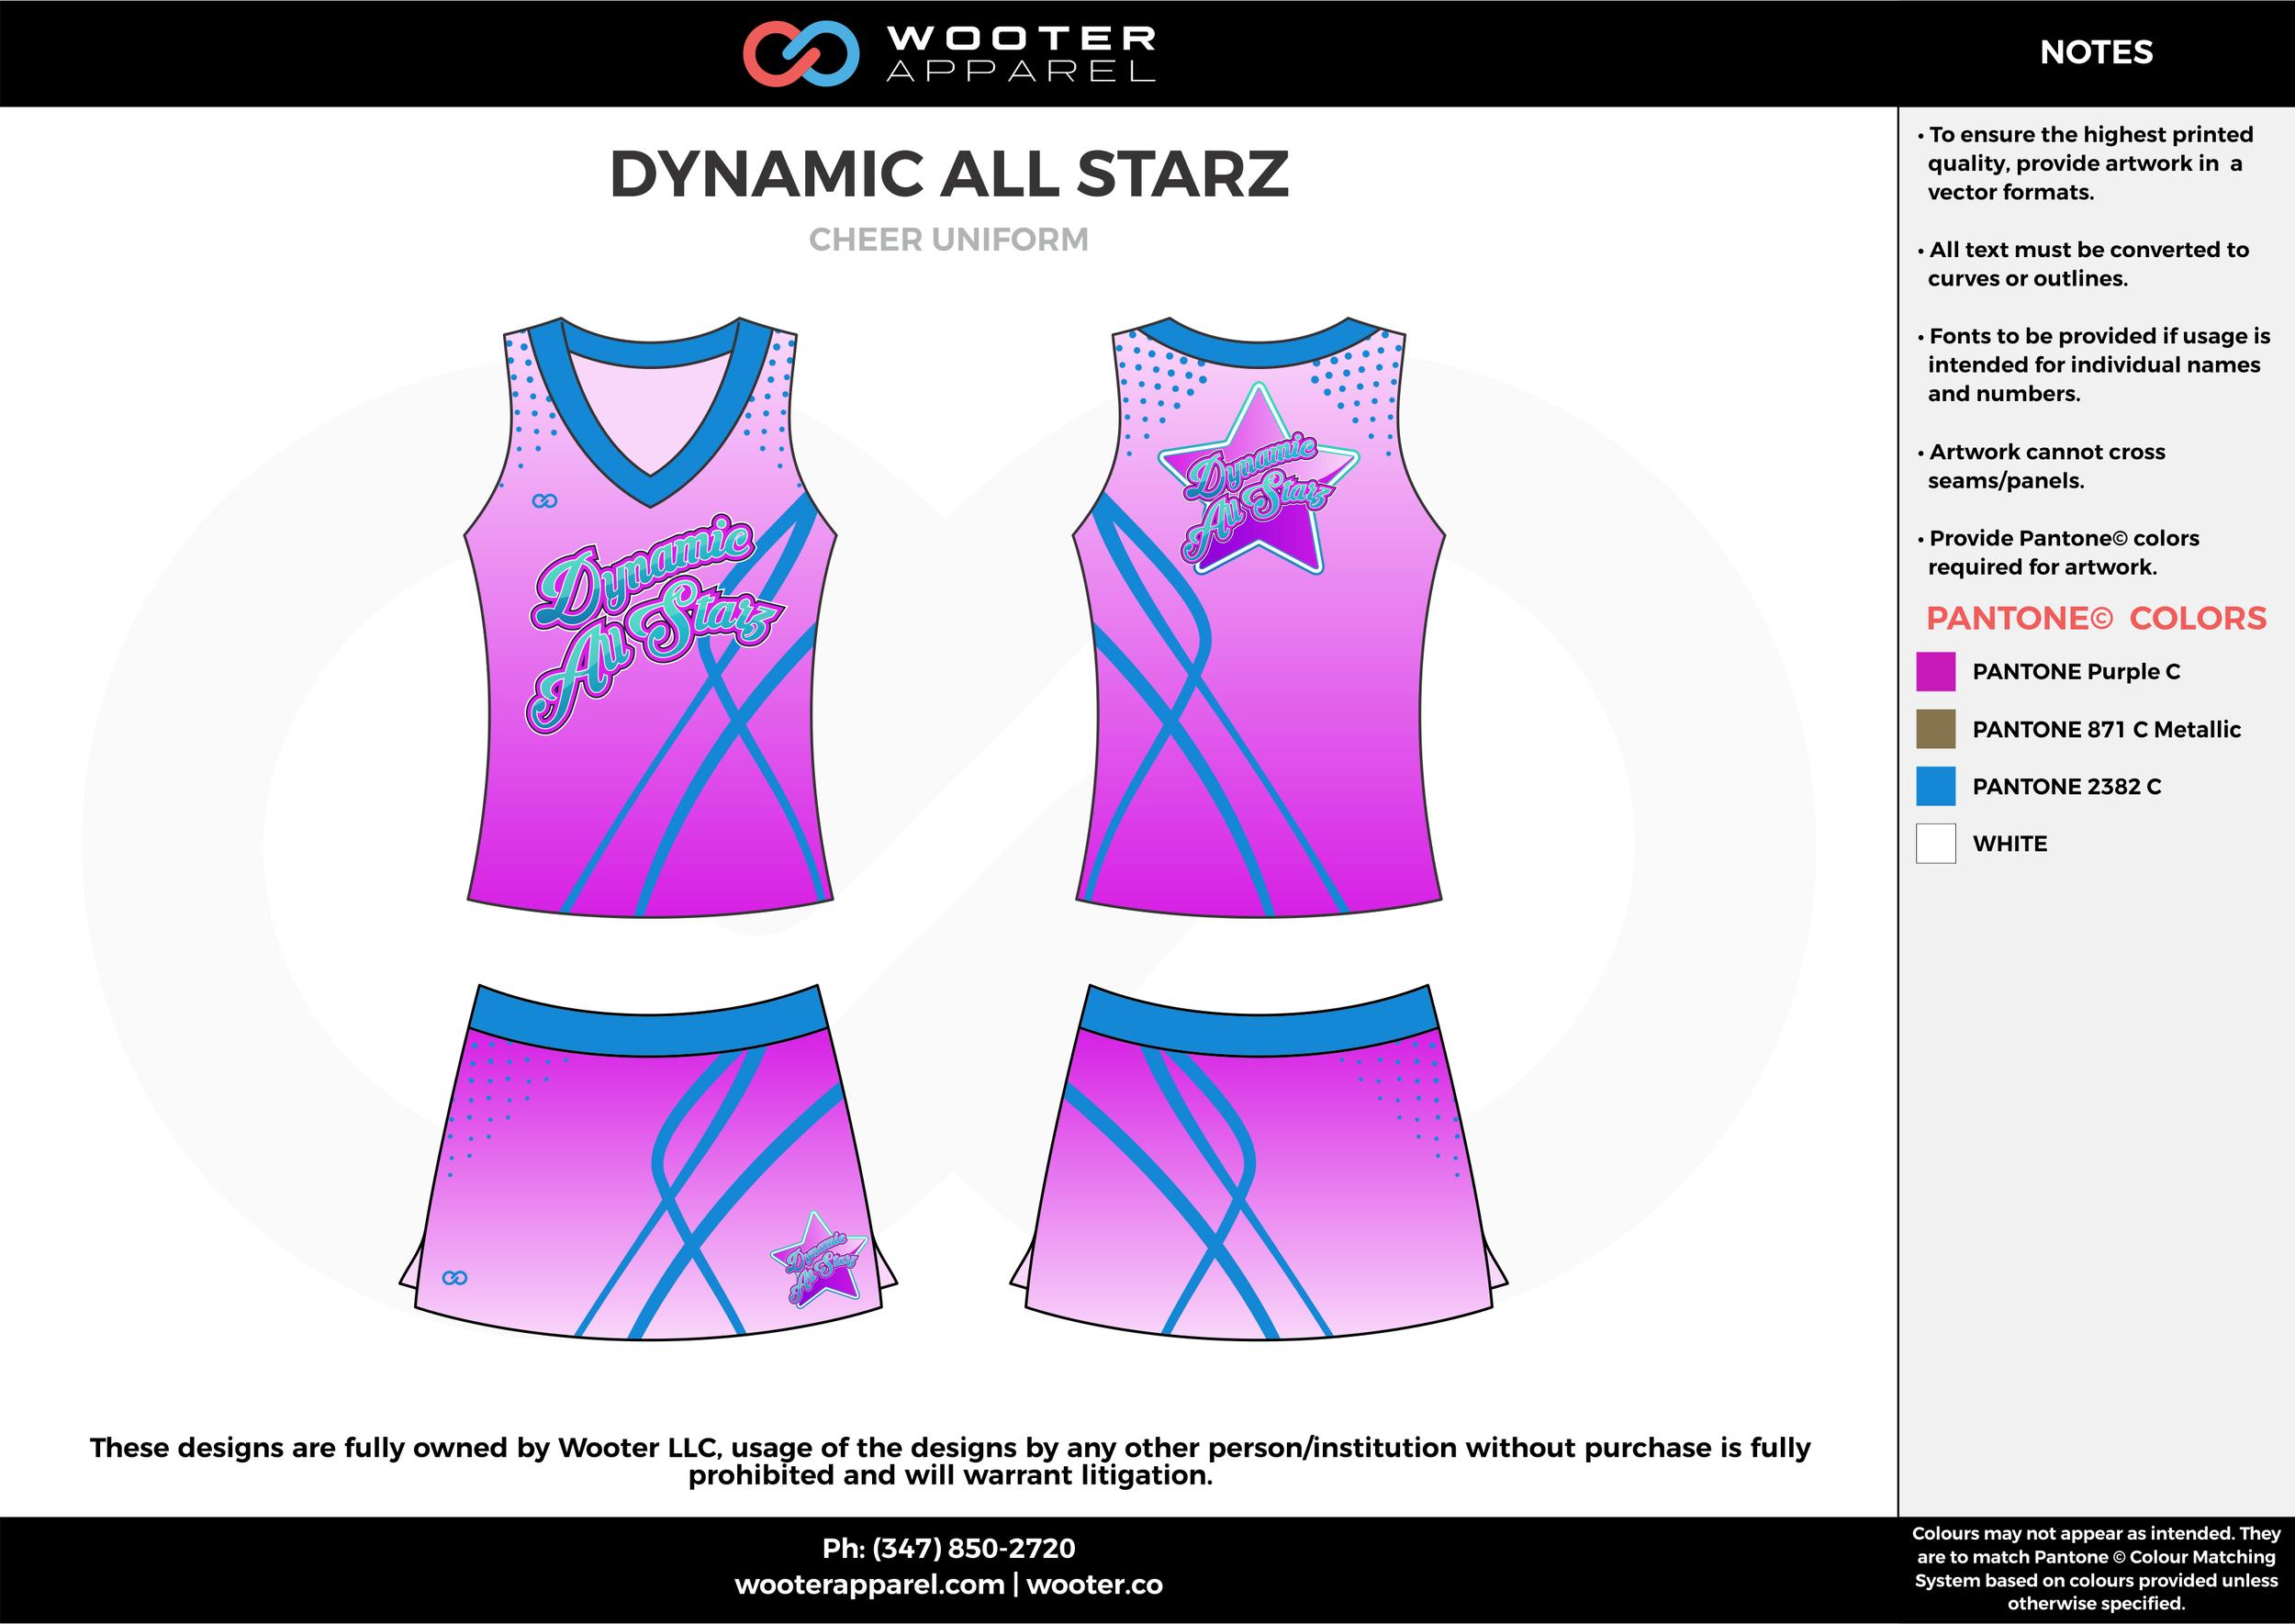 DYNAMIC ALL STARZ lavander blue cheerleading uniforms, top, and skirt